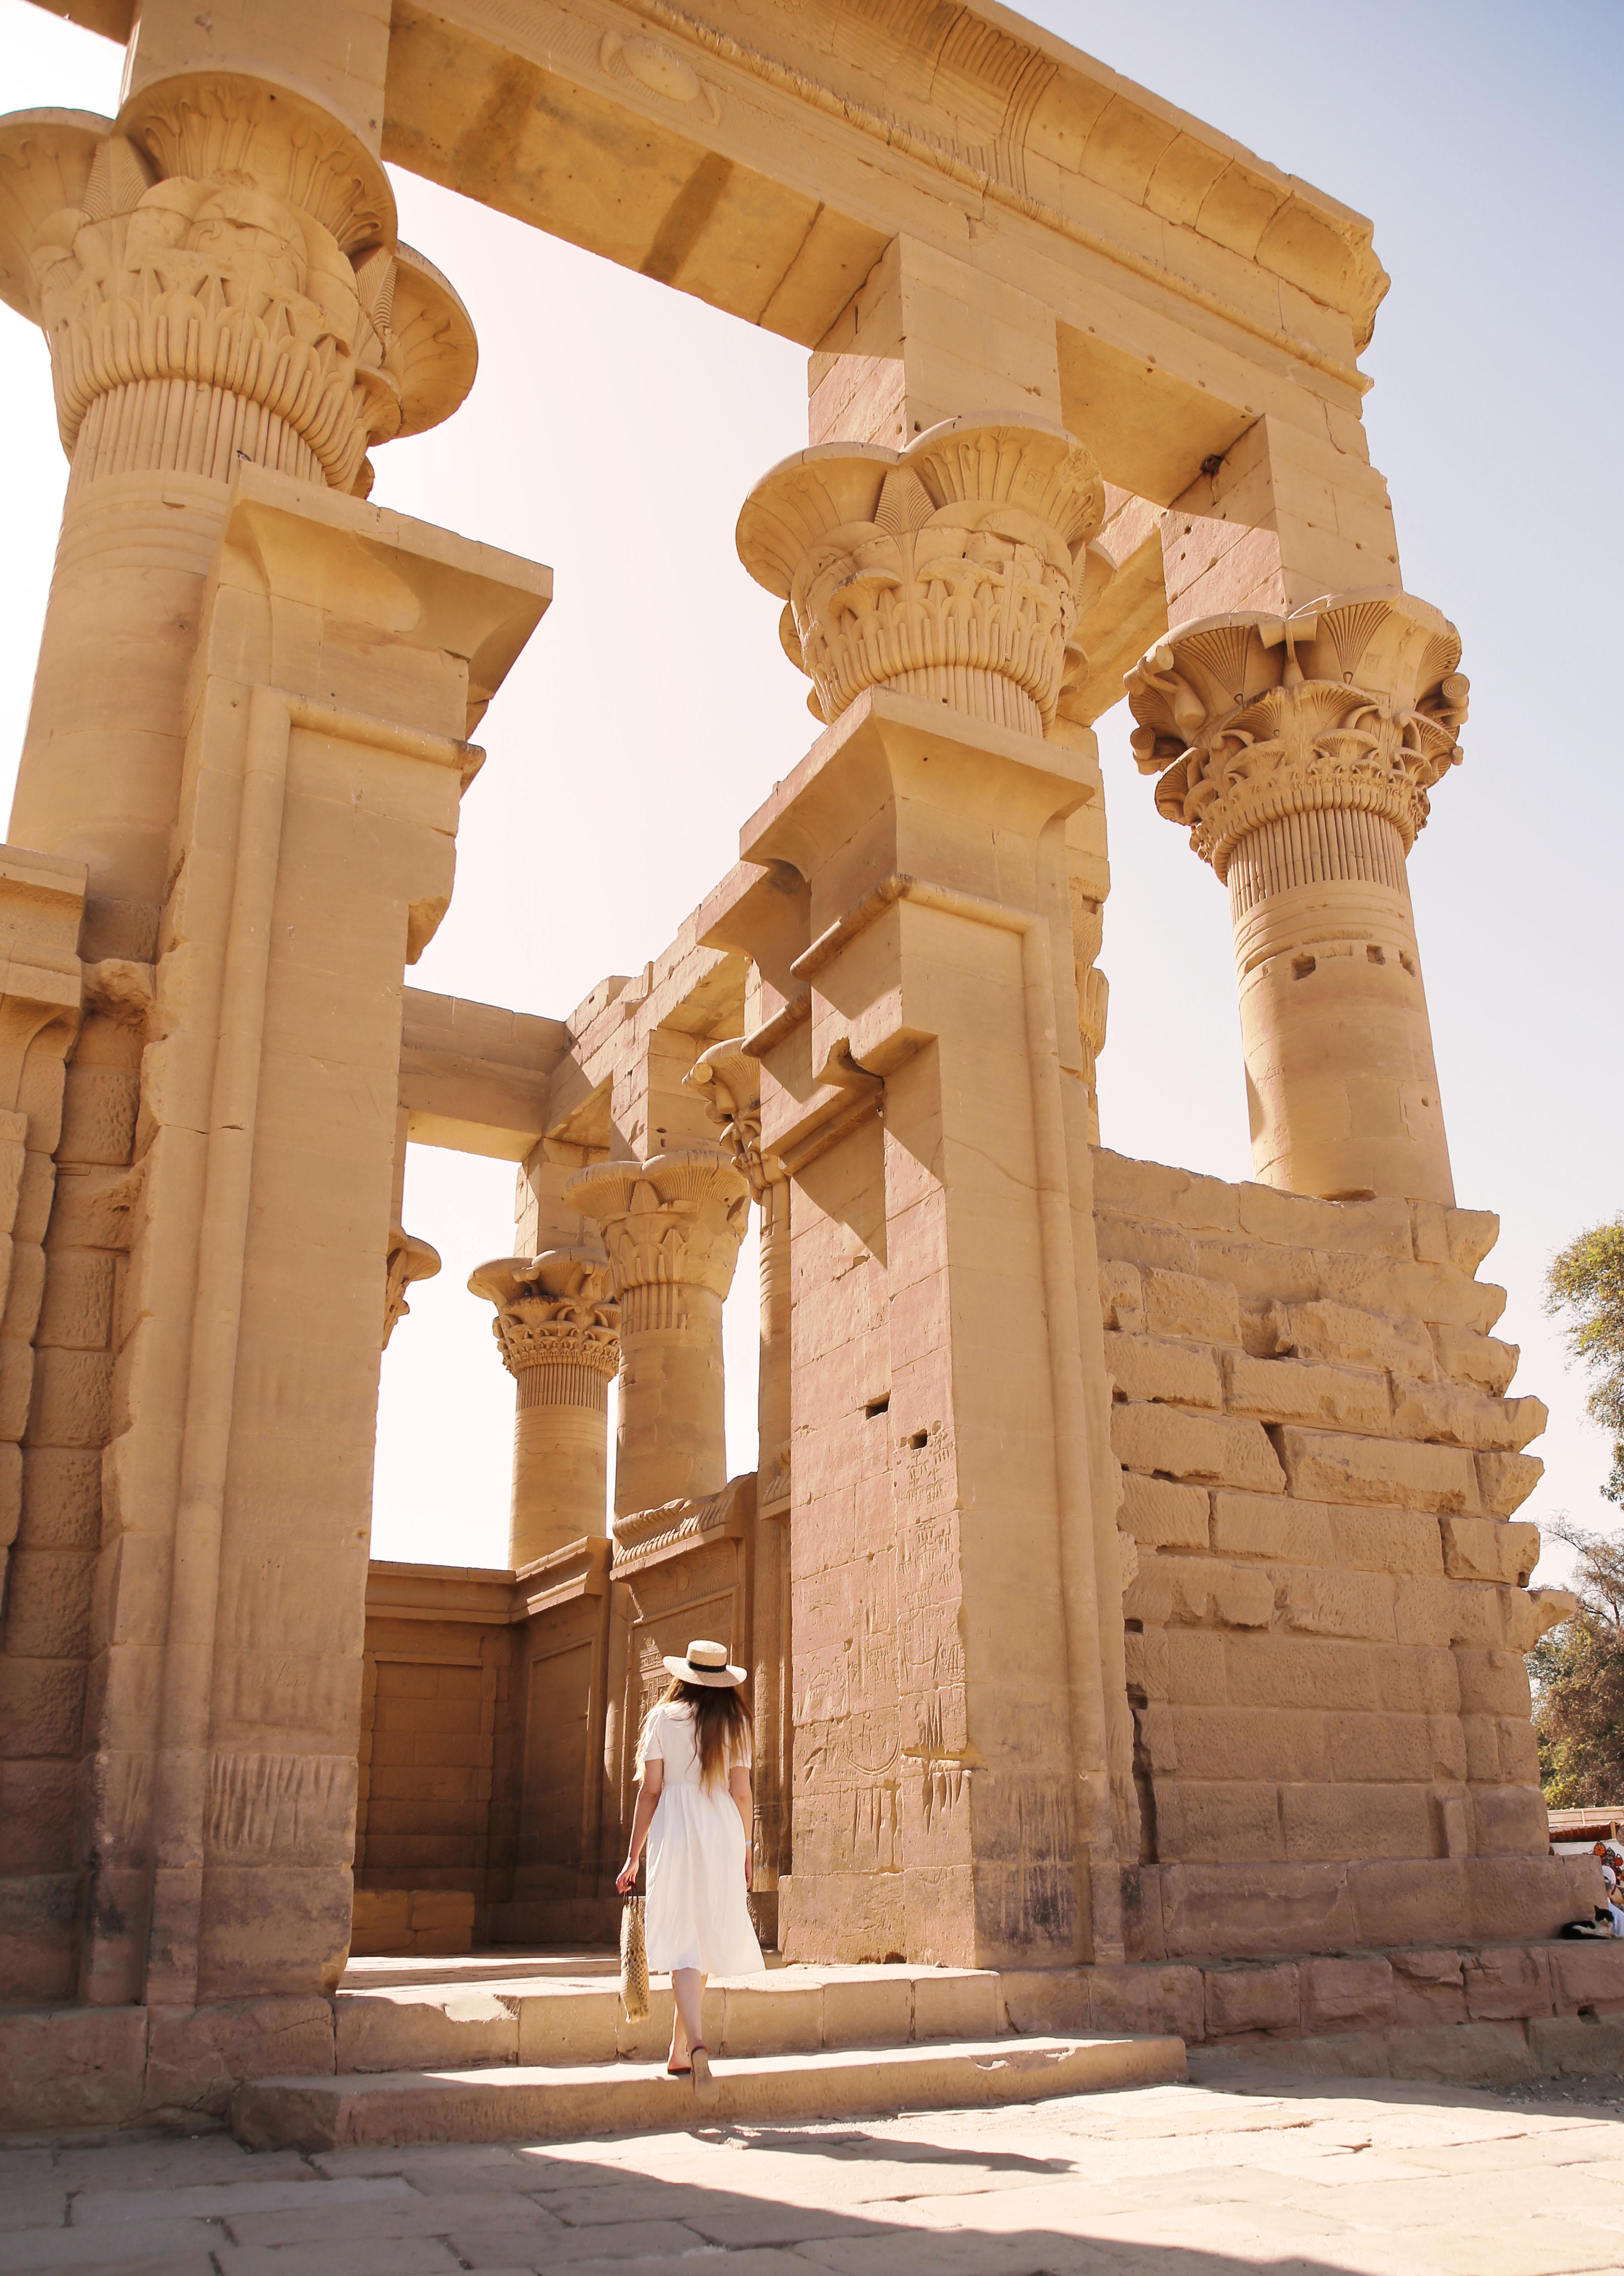 mia und ich blog Trajan Kiosk des Augustus Papyrus Kapitelle Philea Tempel Ägypten Egypt